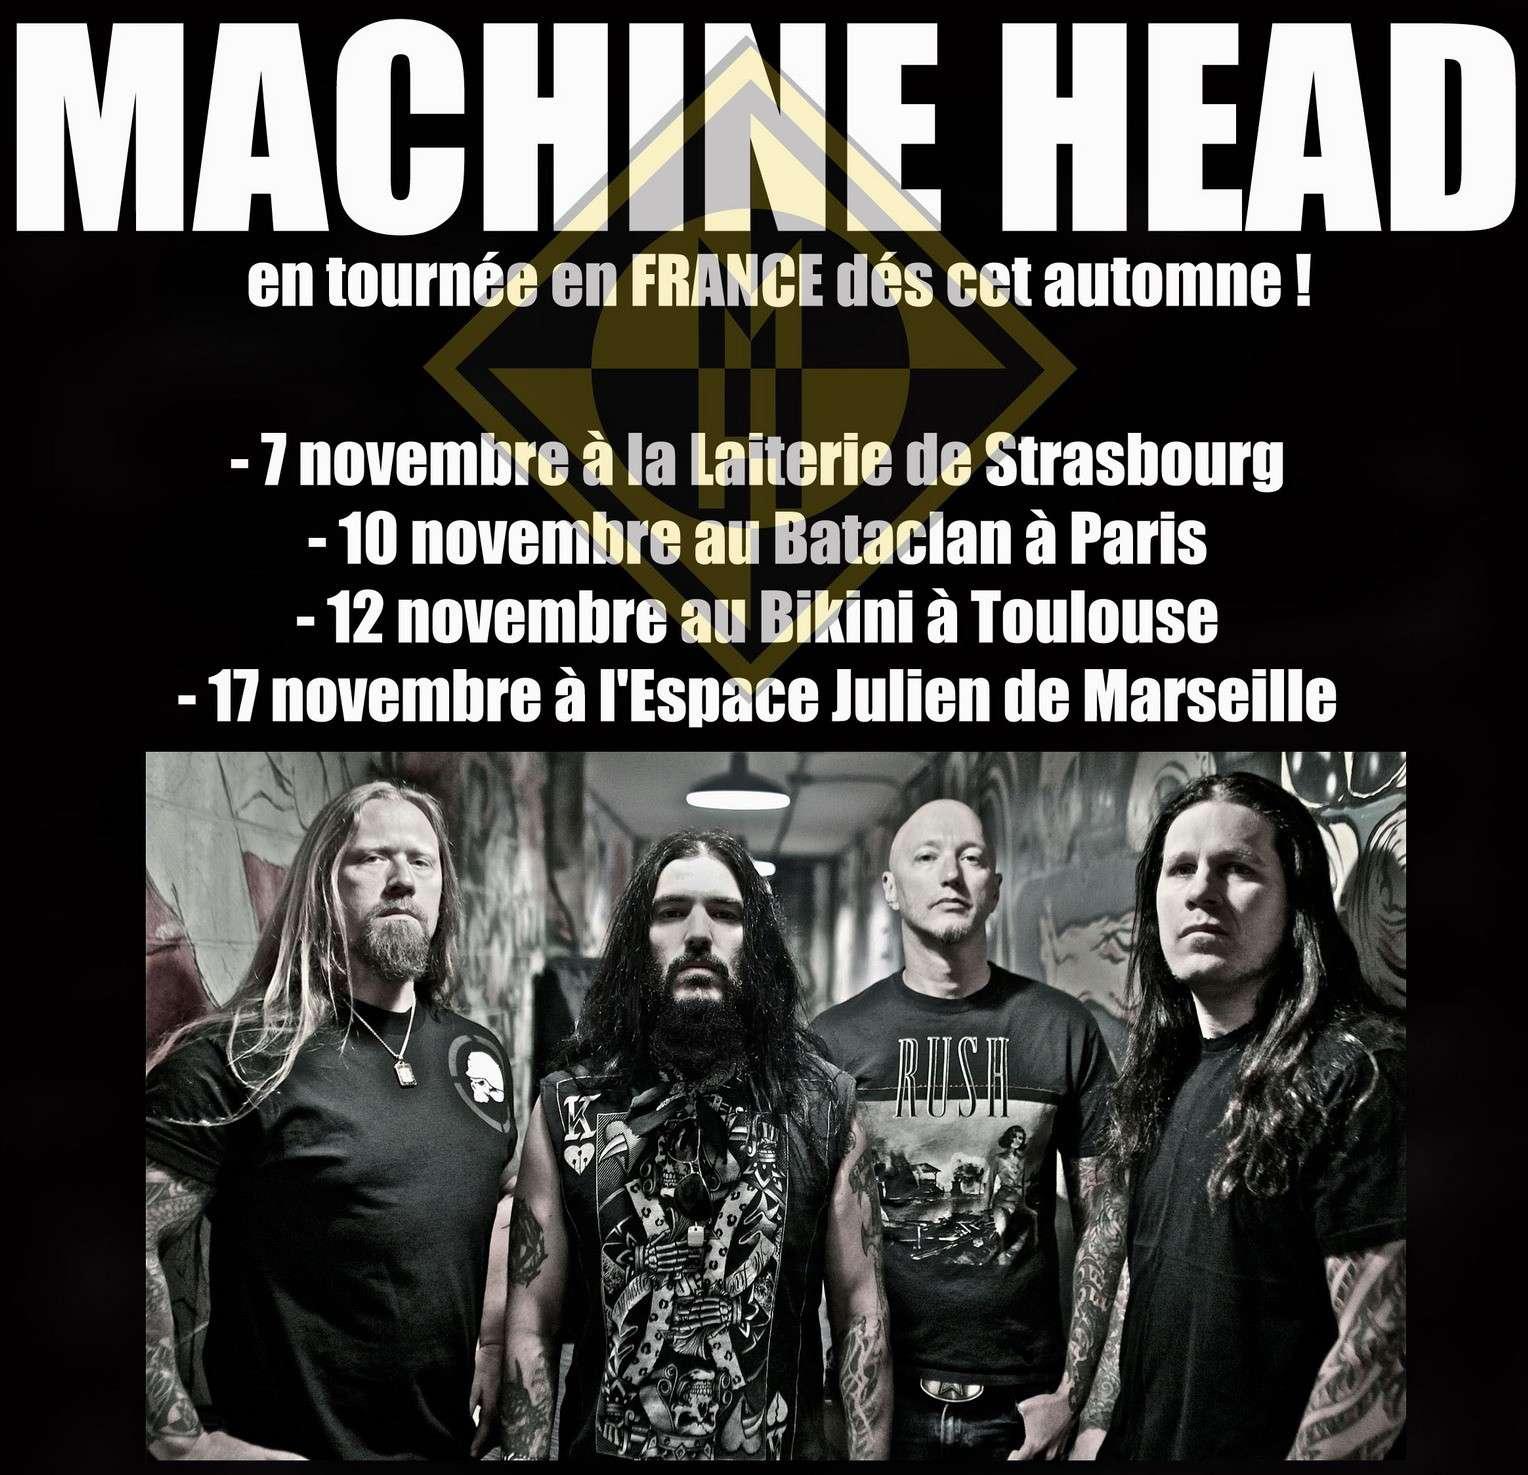 Les NEWS du METAL en VRAC ... - Page 5 Machin10